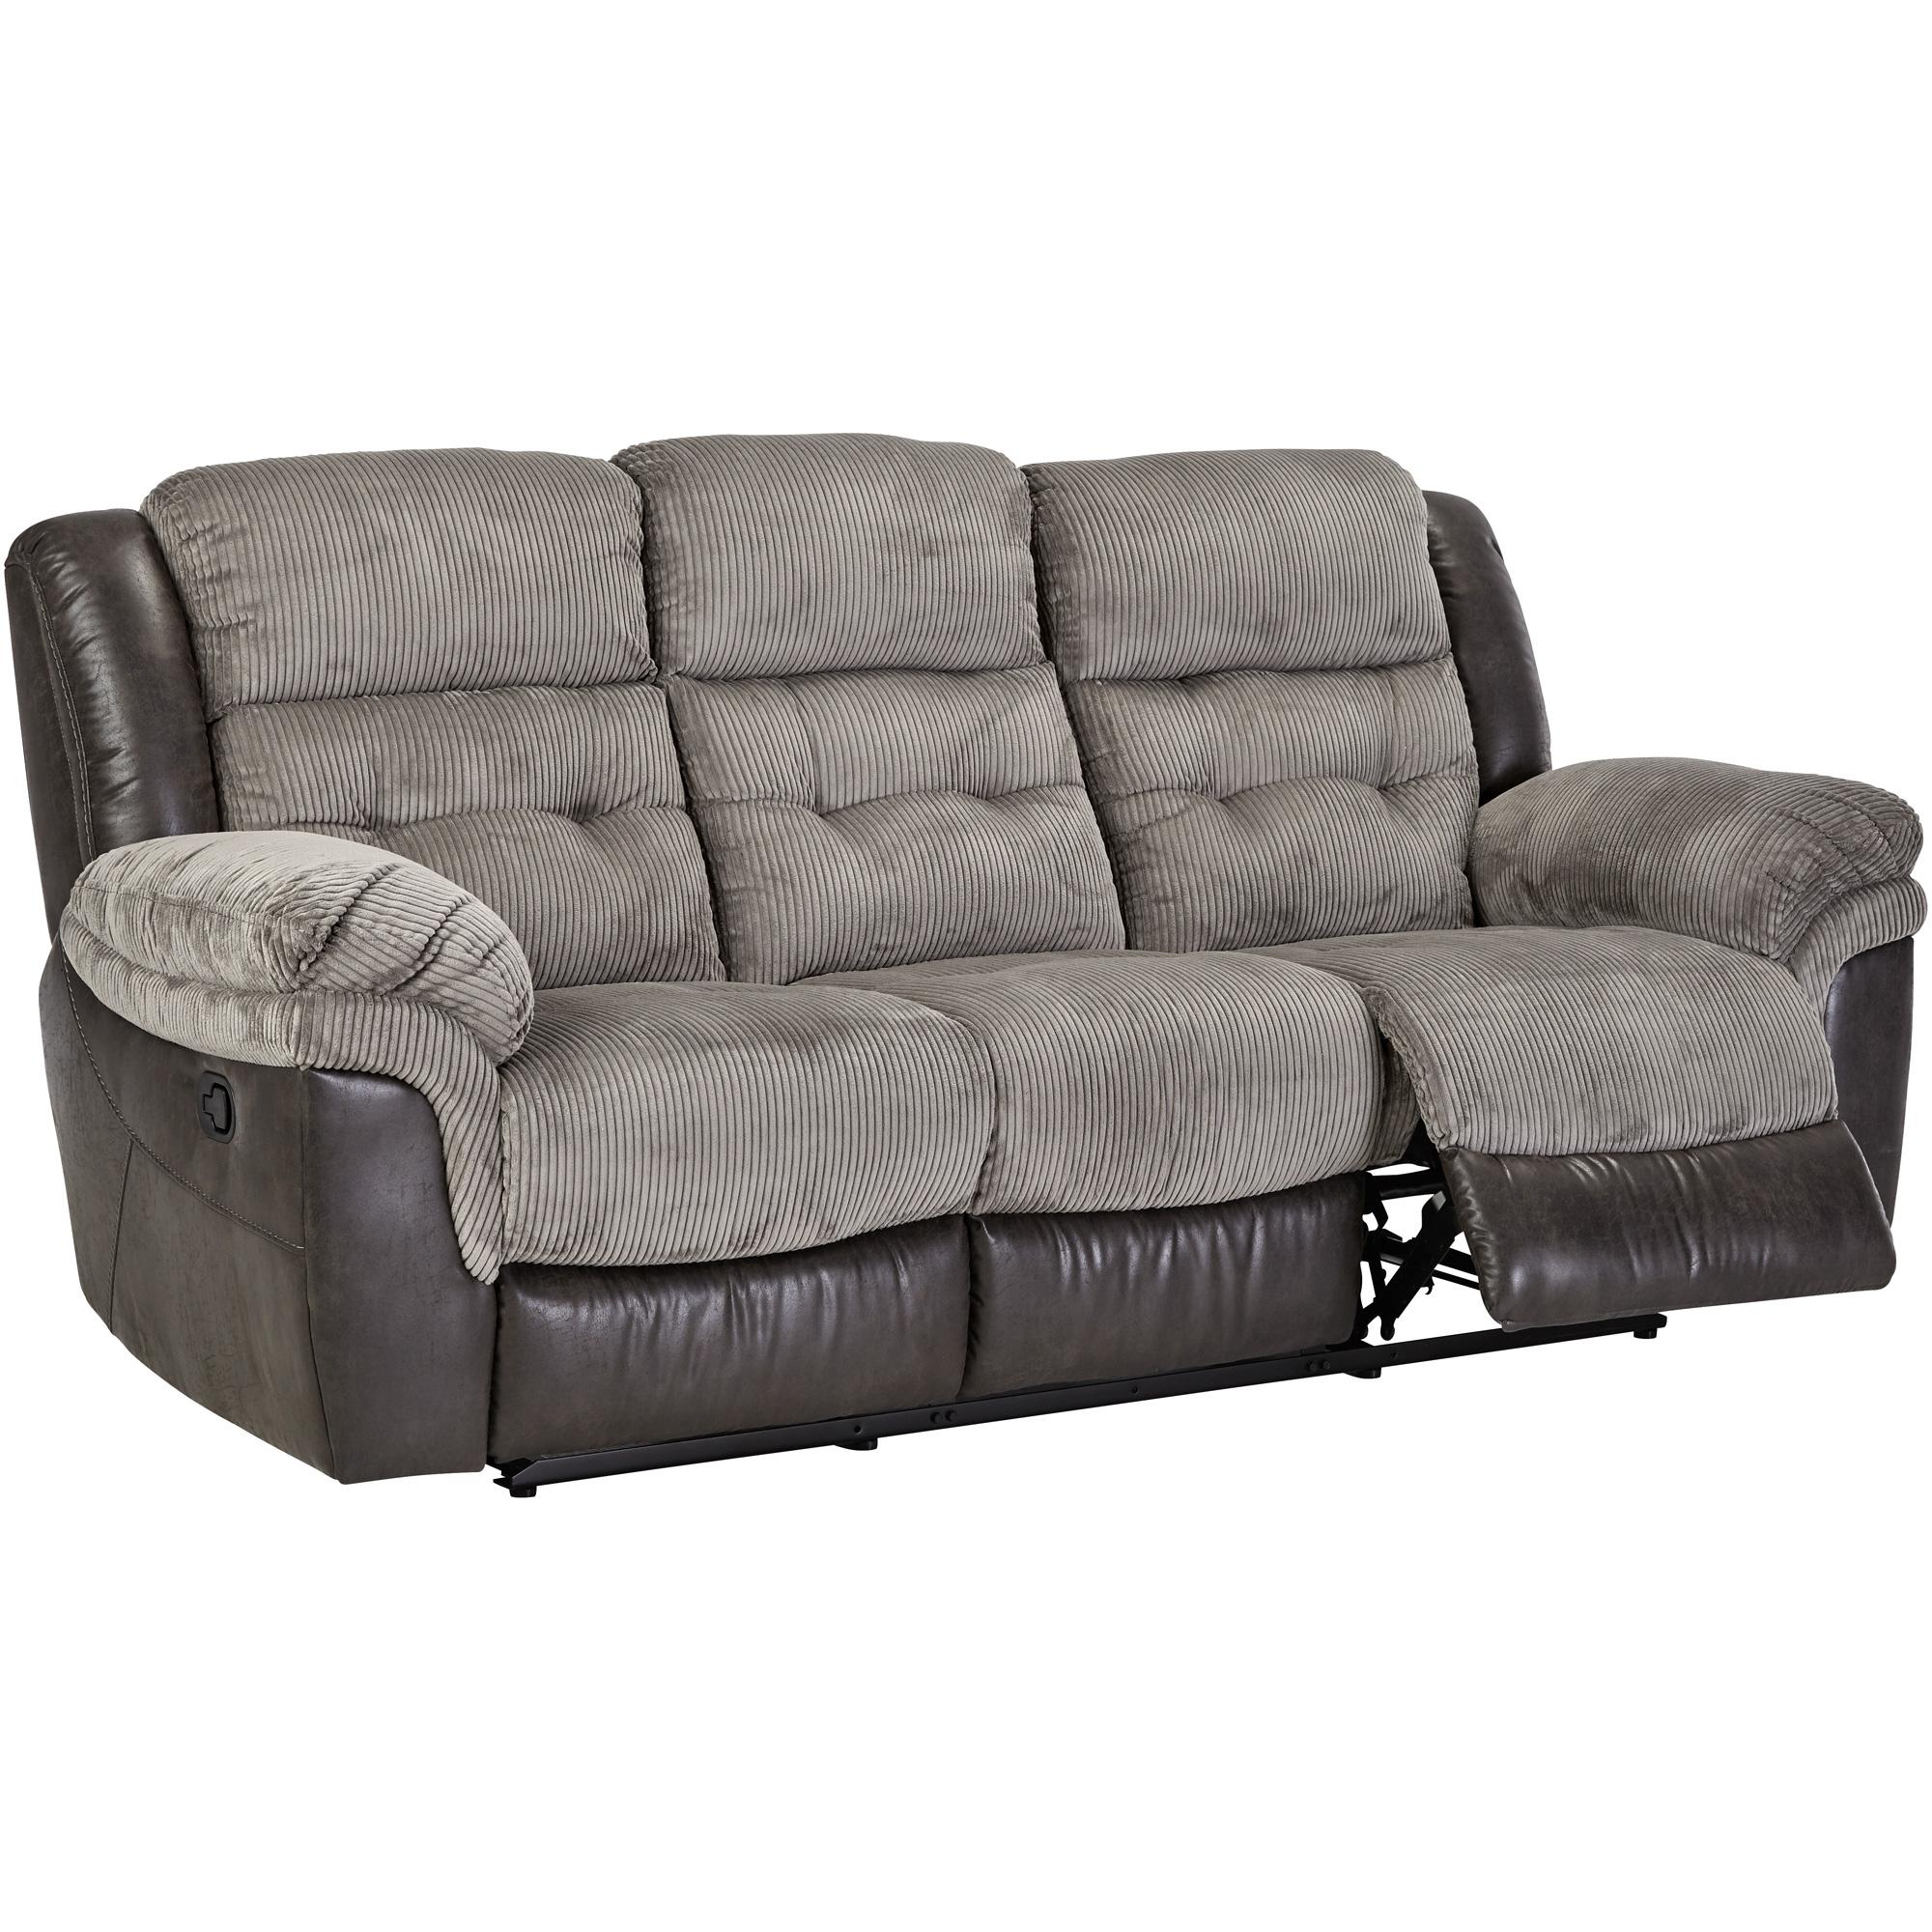 Wah Cheers | Dunkirk Steel Reclining Sofa